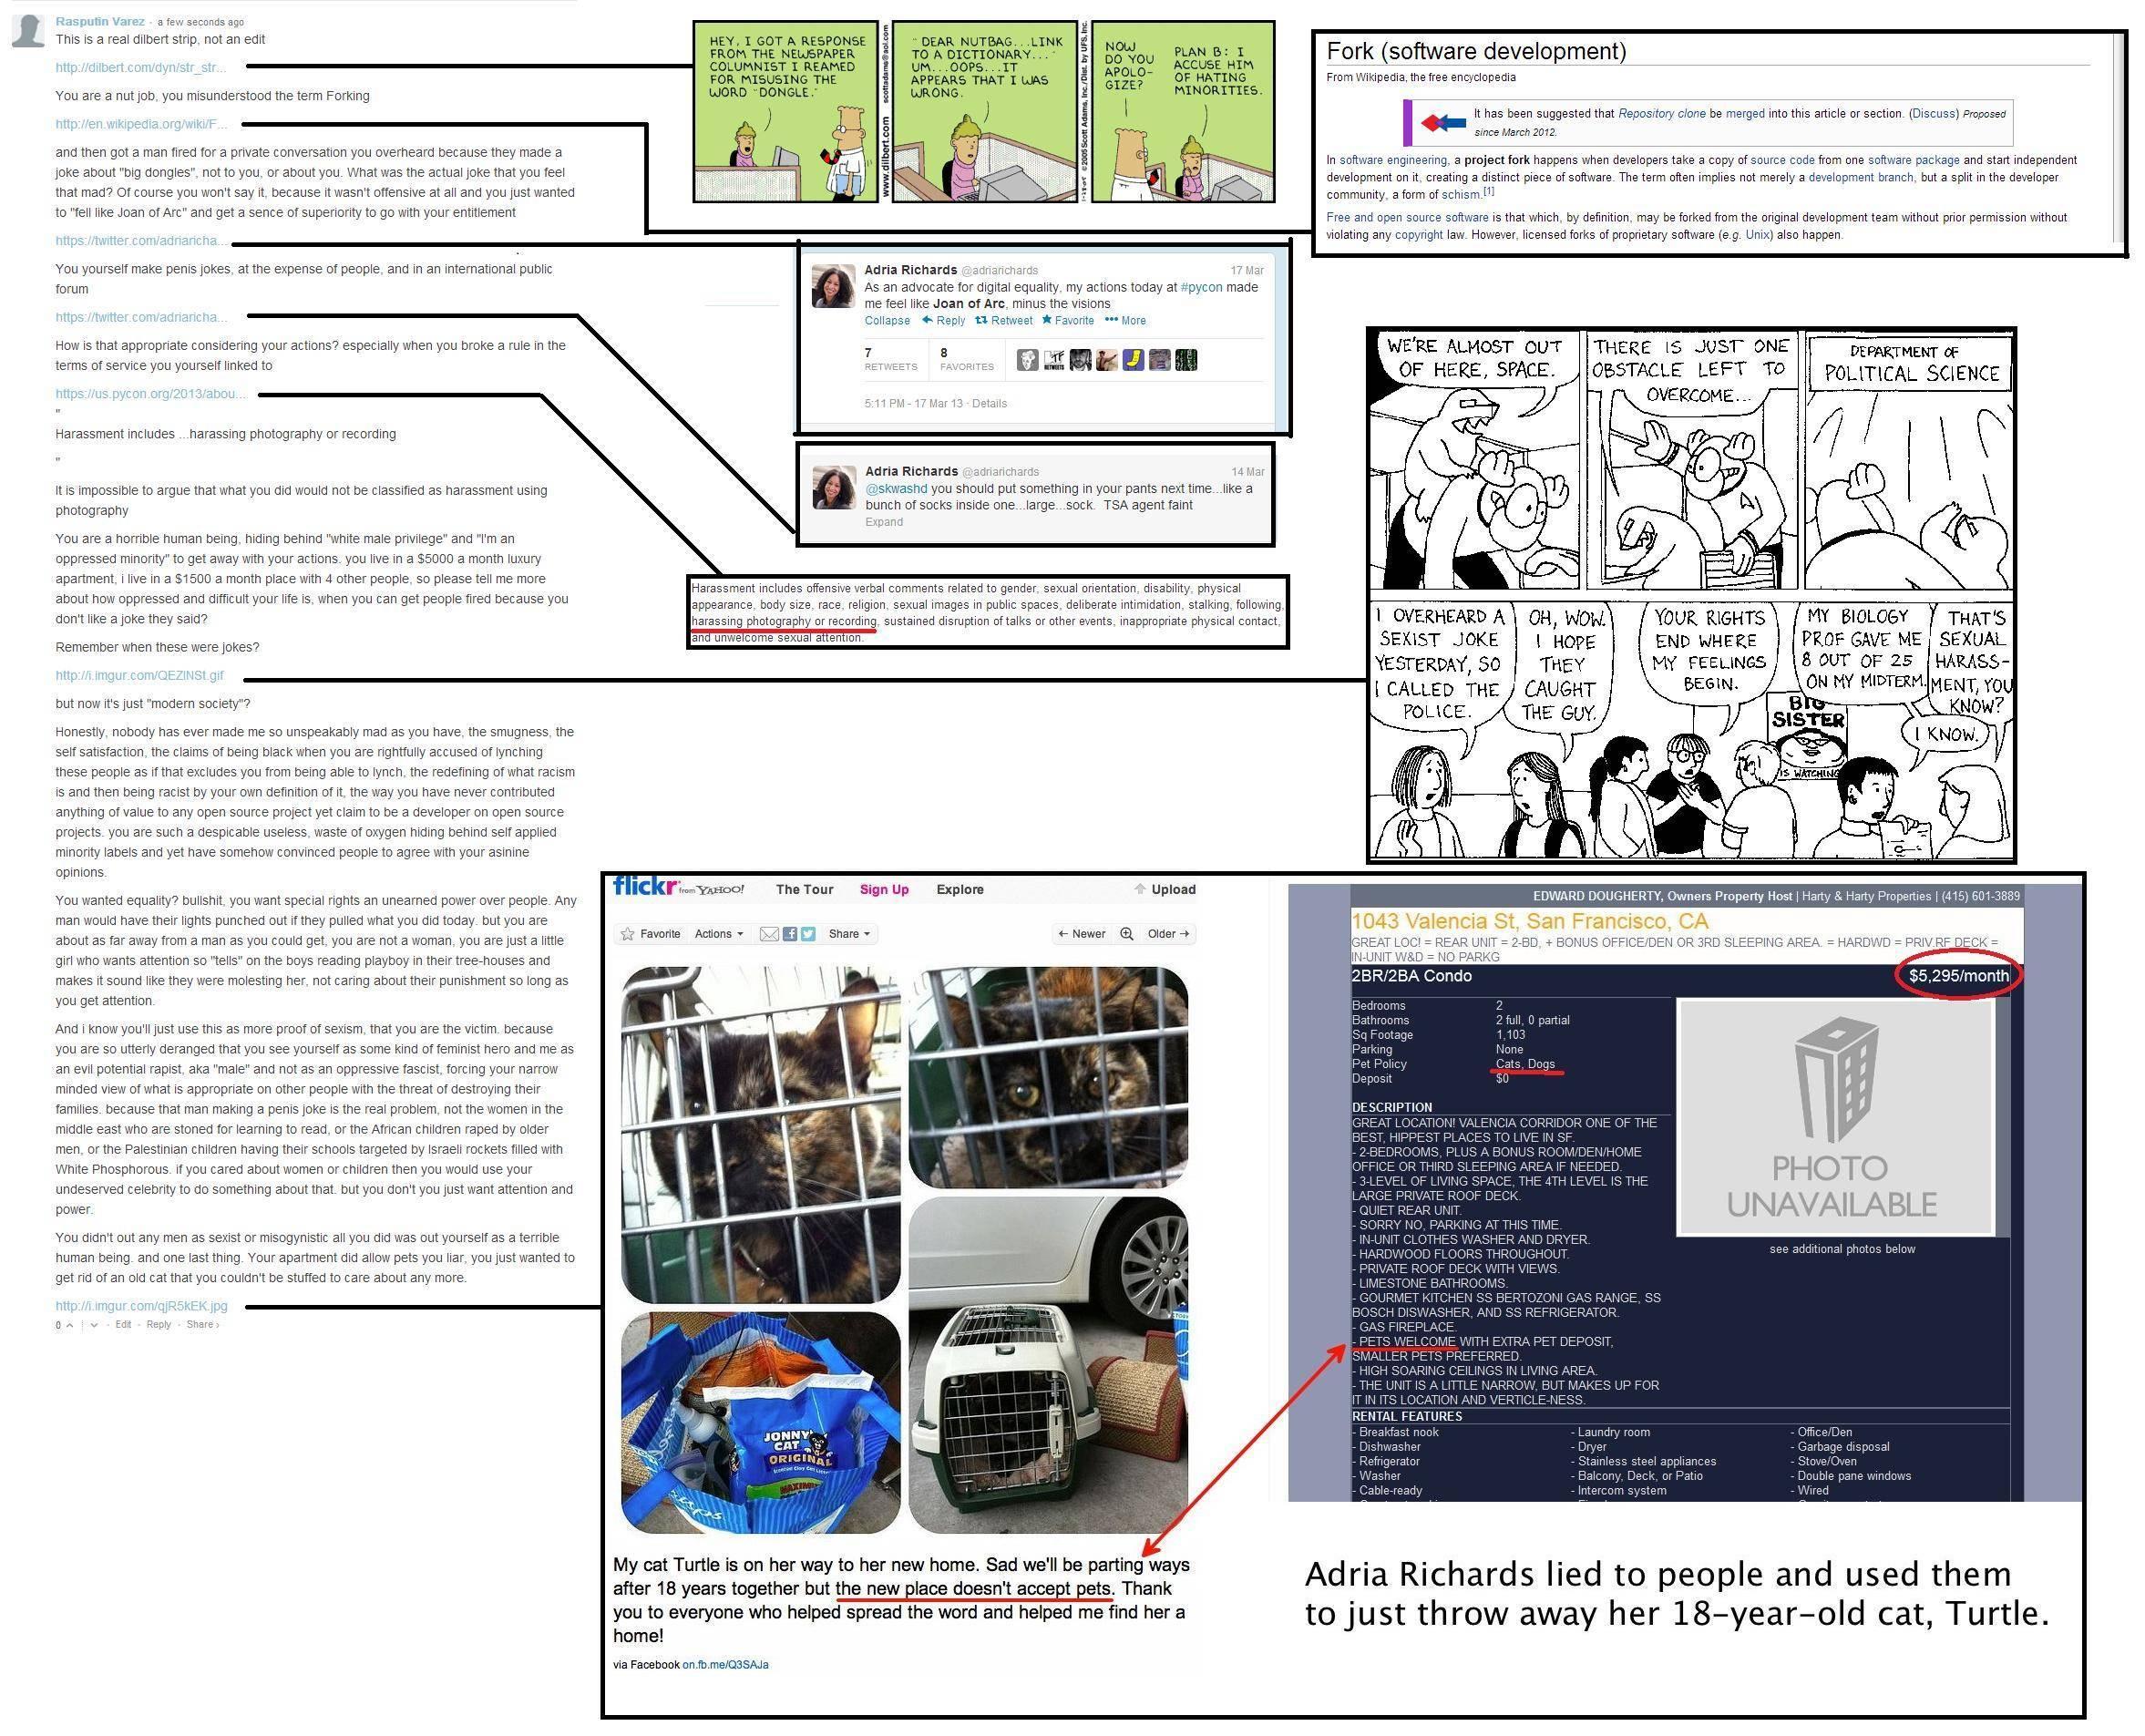 Adria Richards Map Donglegate Adria Richards Know Your Meme